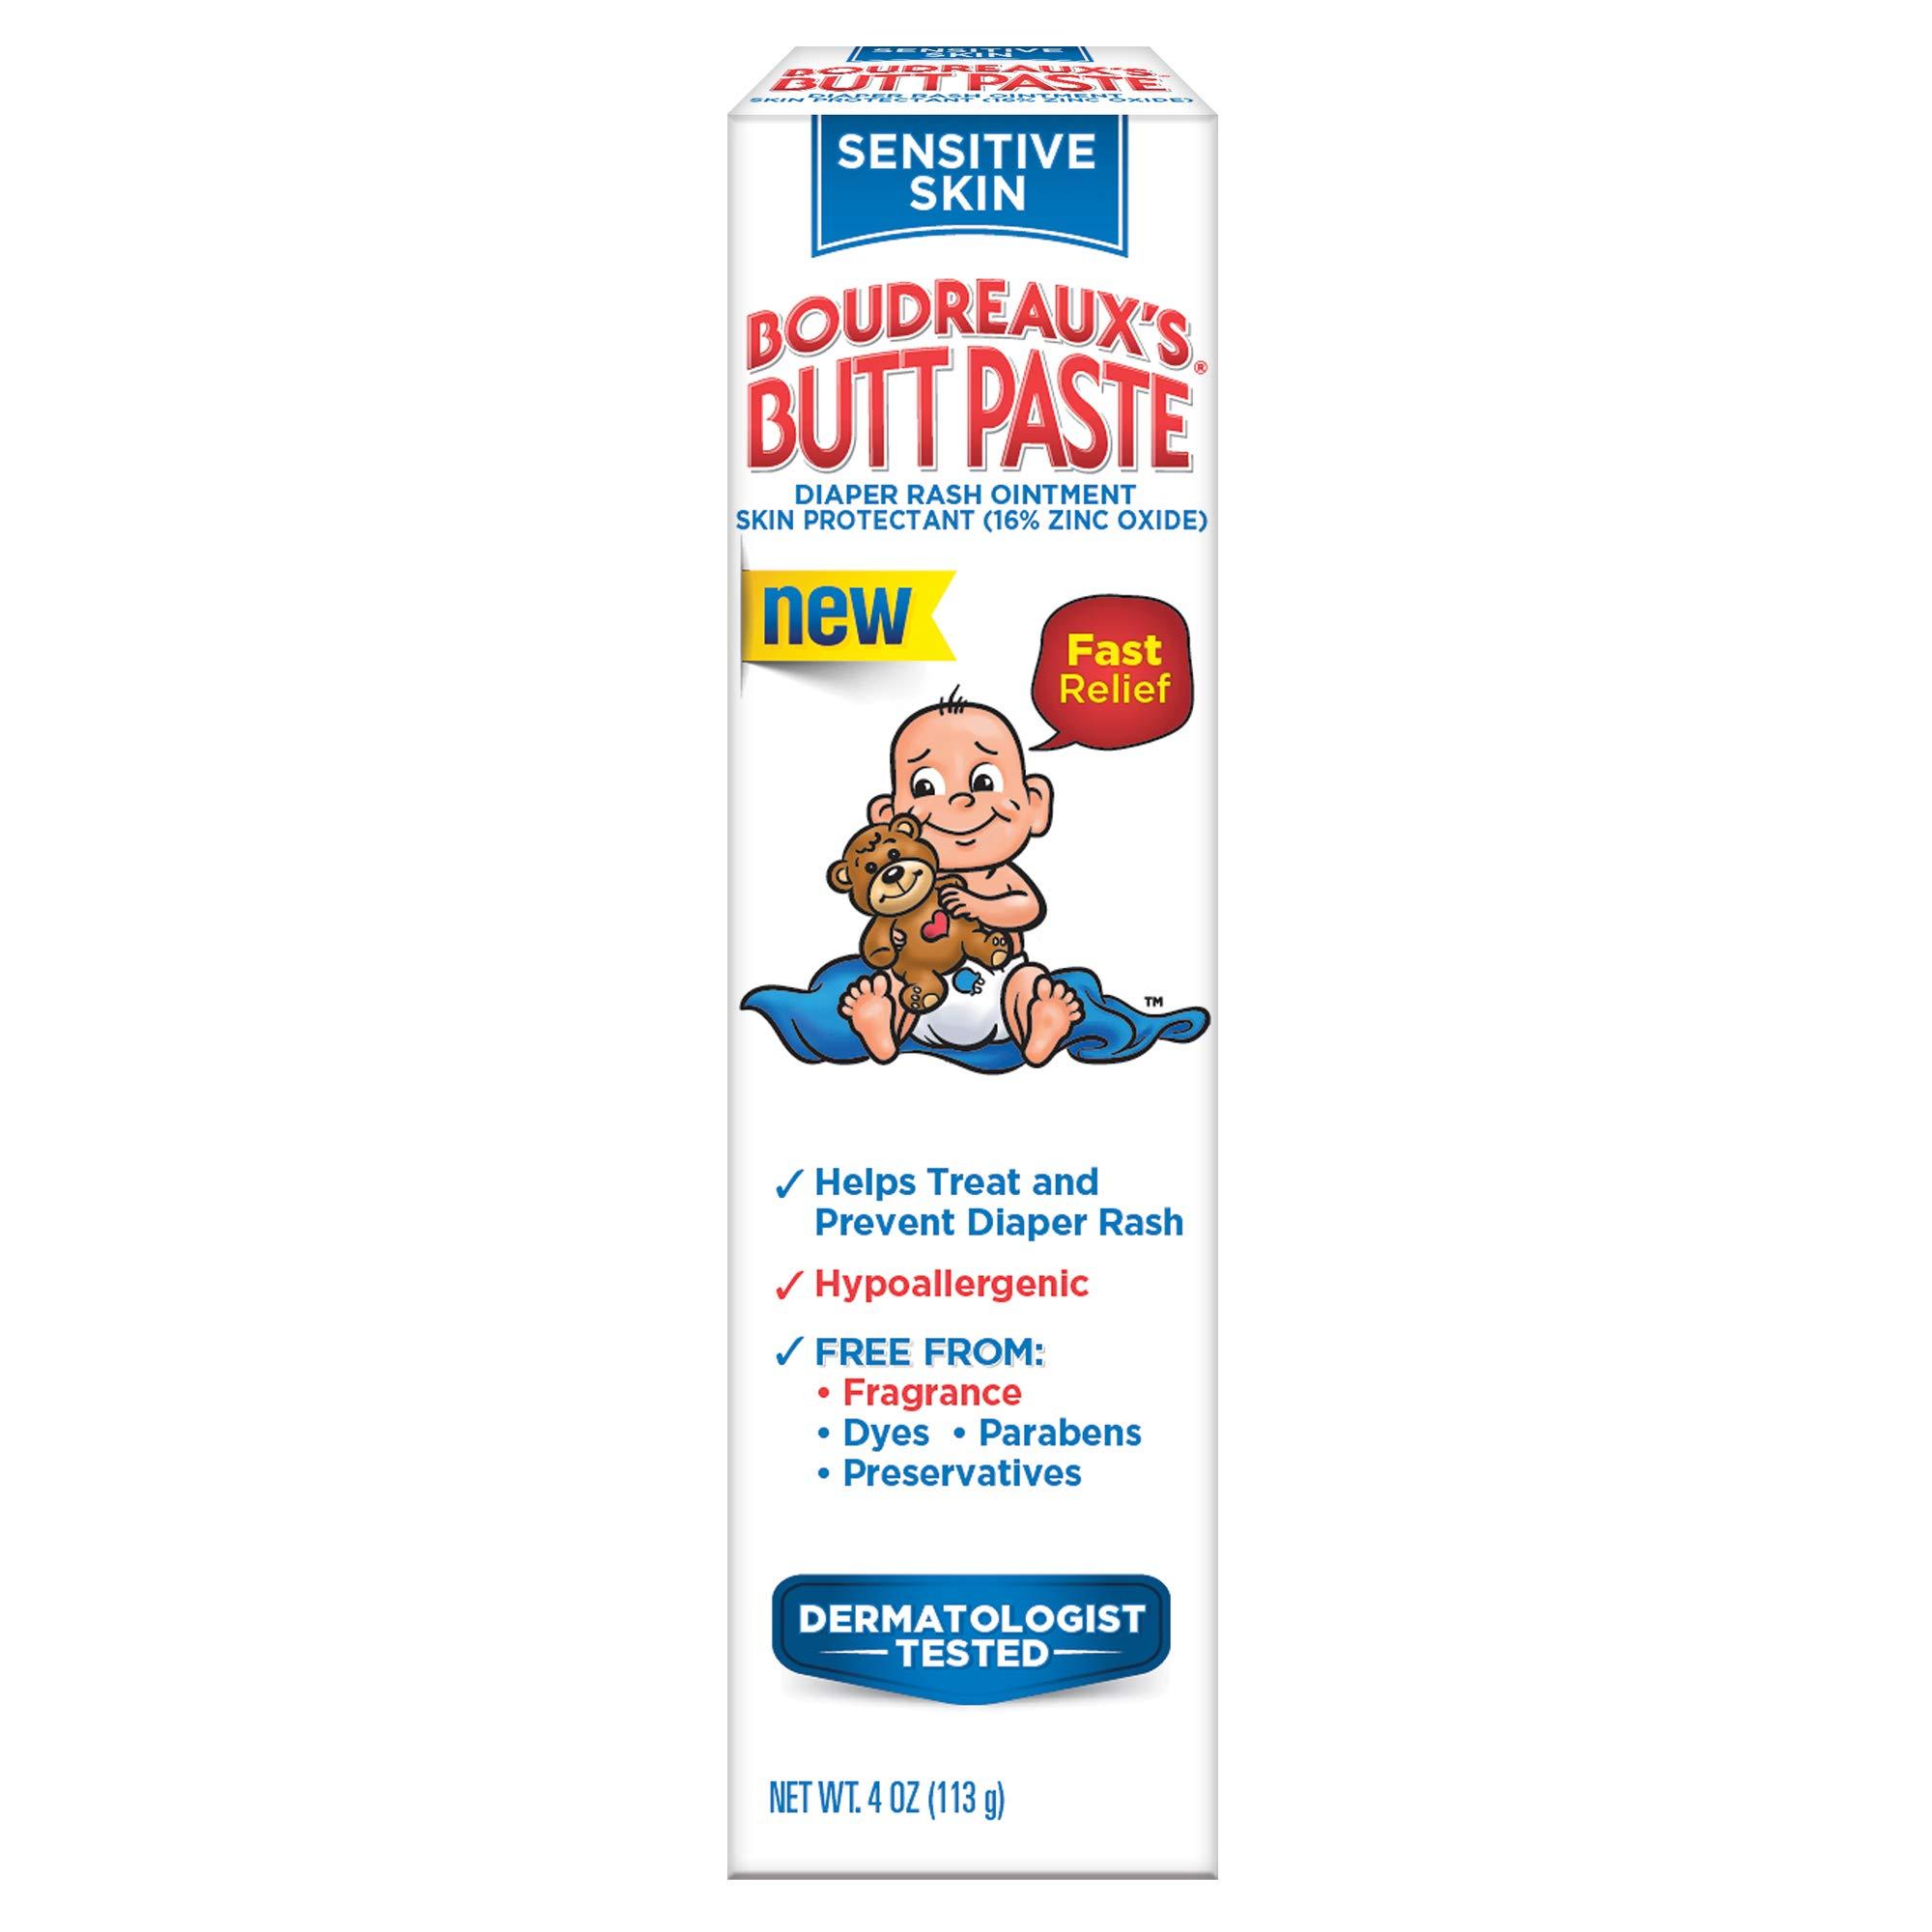 Boudreaux's Butt Paste Diaper Rash Ointment for Sensitive Skin, Hypoallergenic, 4 Oz